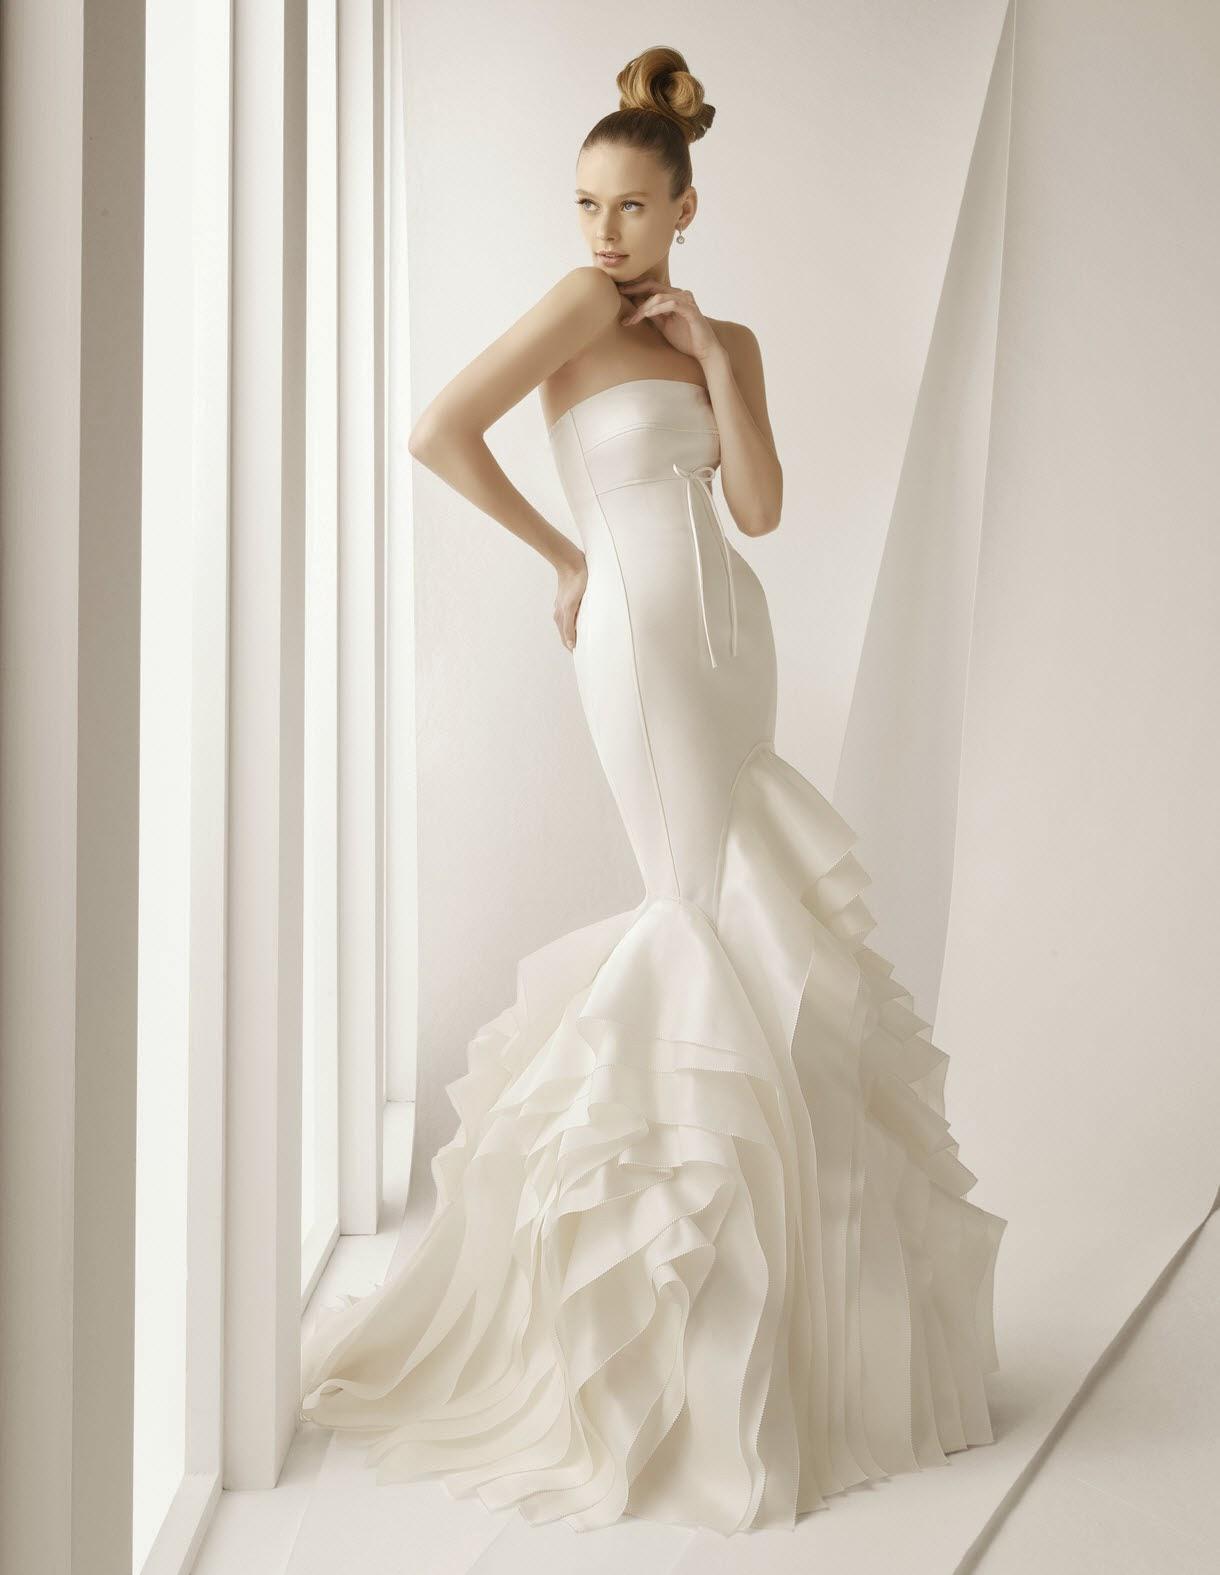 mermaid wedding dresses petite brides wedding dresses petite Mermaid Wedding Dresses Petite Brides 12